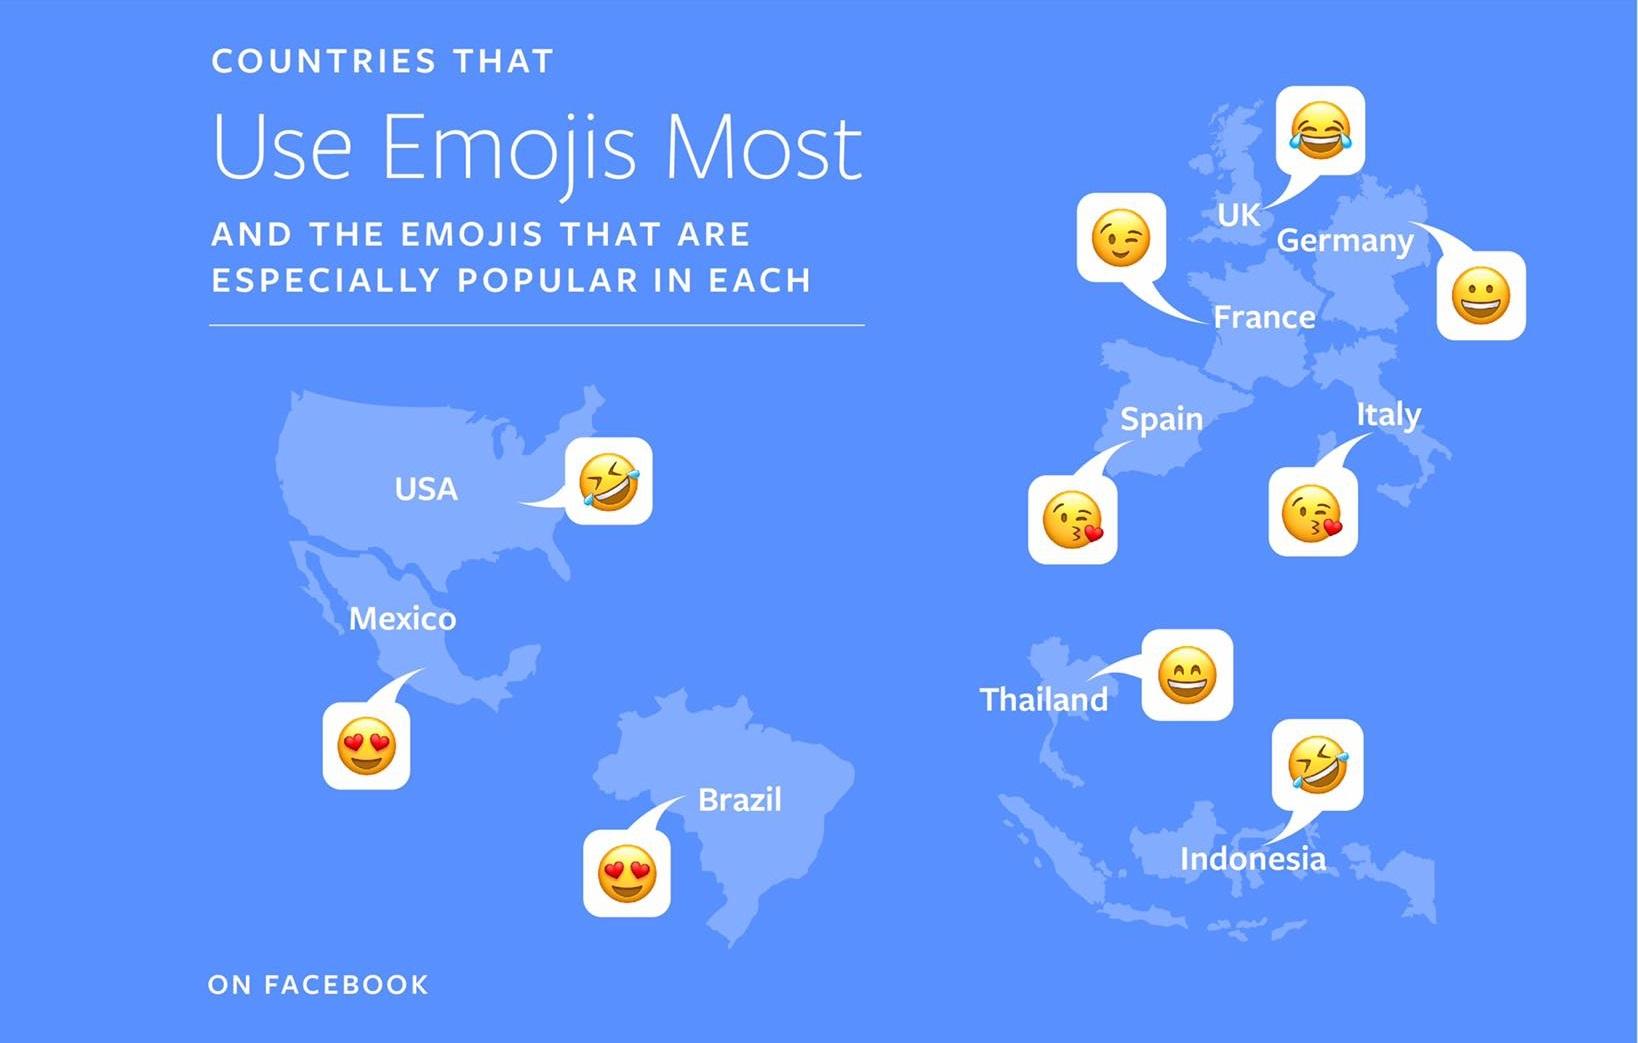 Use Emojis Most